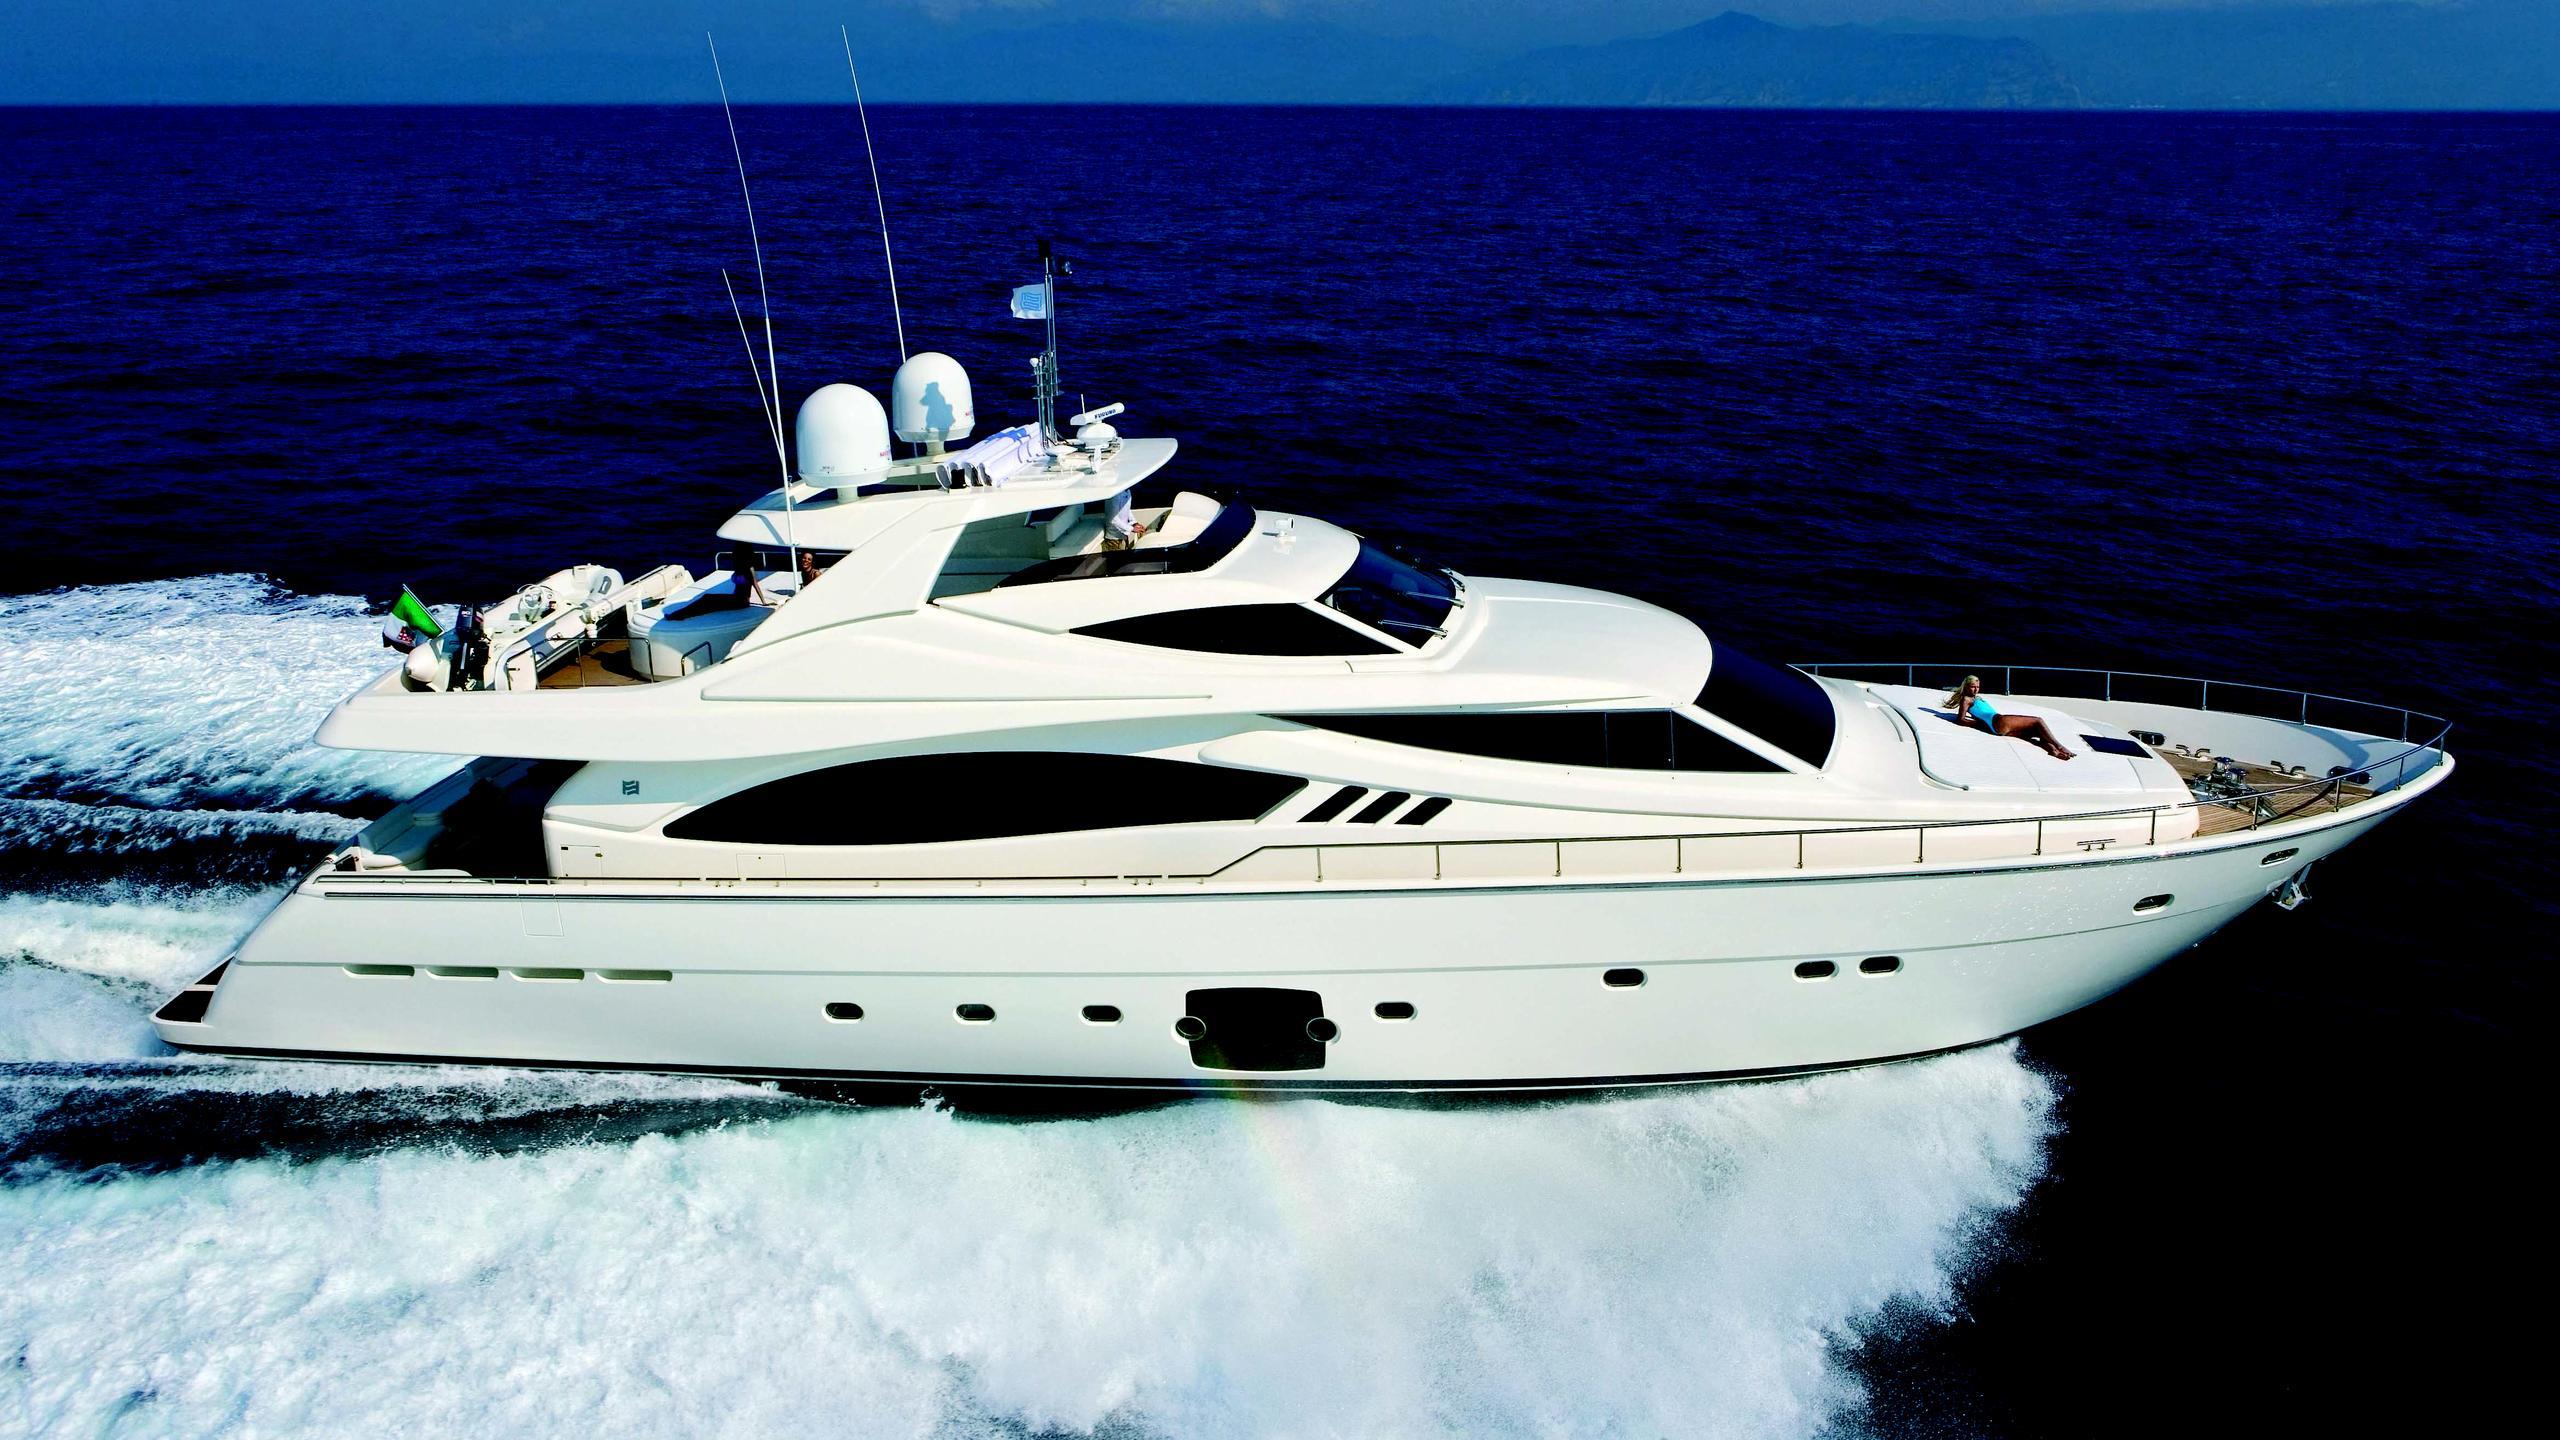 inspiration-motor-yacht-ferretti-881-rph-2010-27m-cruising